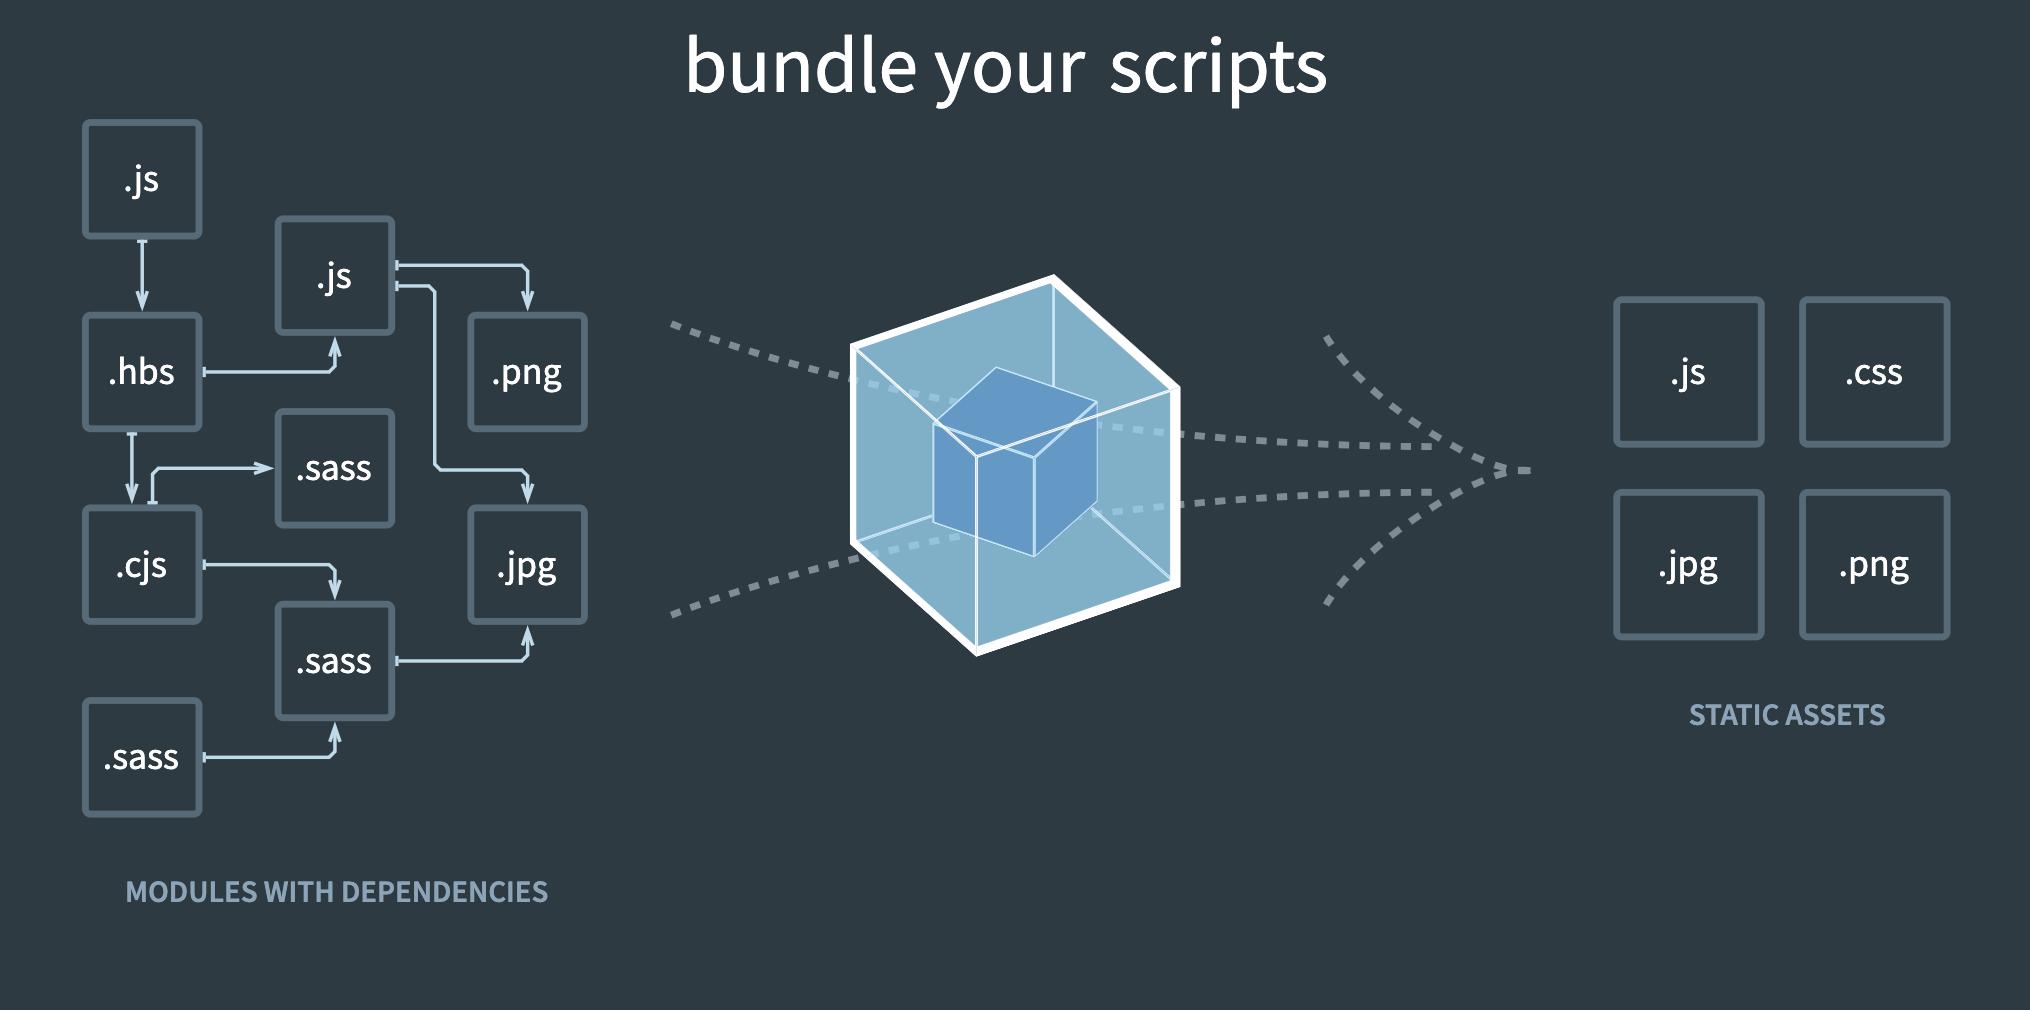 Webpack Diagram from https://webpack.js.org/